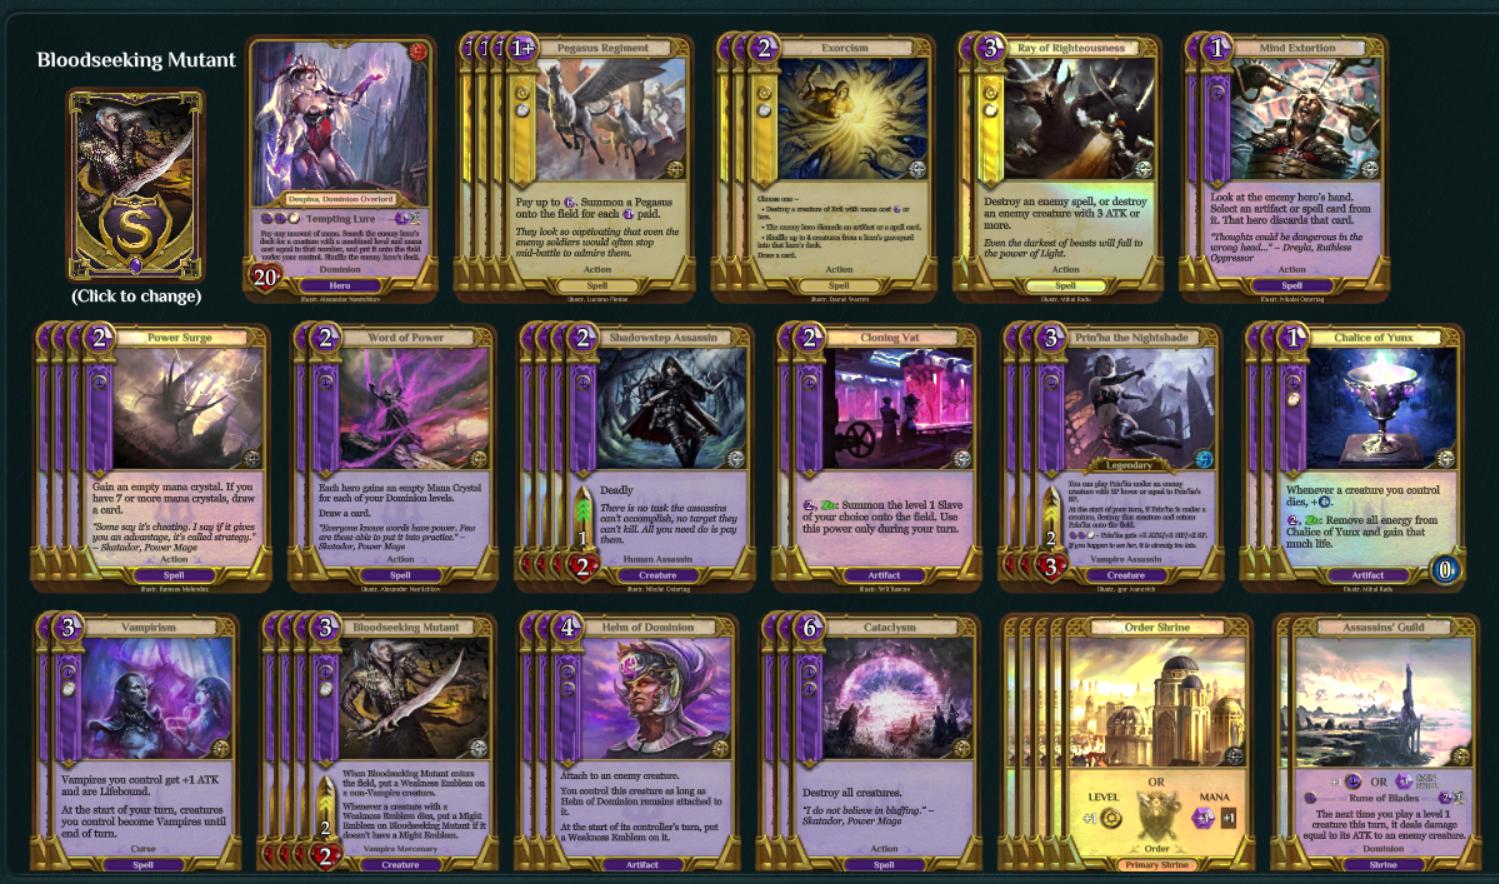 Shrines: 5 Order, 2 Assassin's Guild, 2 Stronghold Metropolis, 10 Dominion